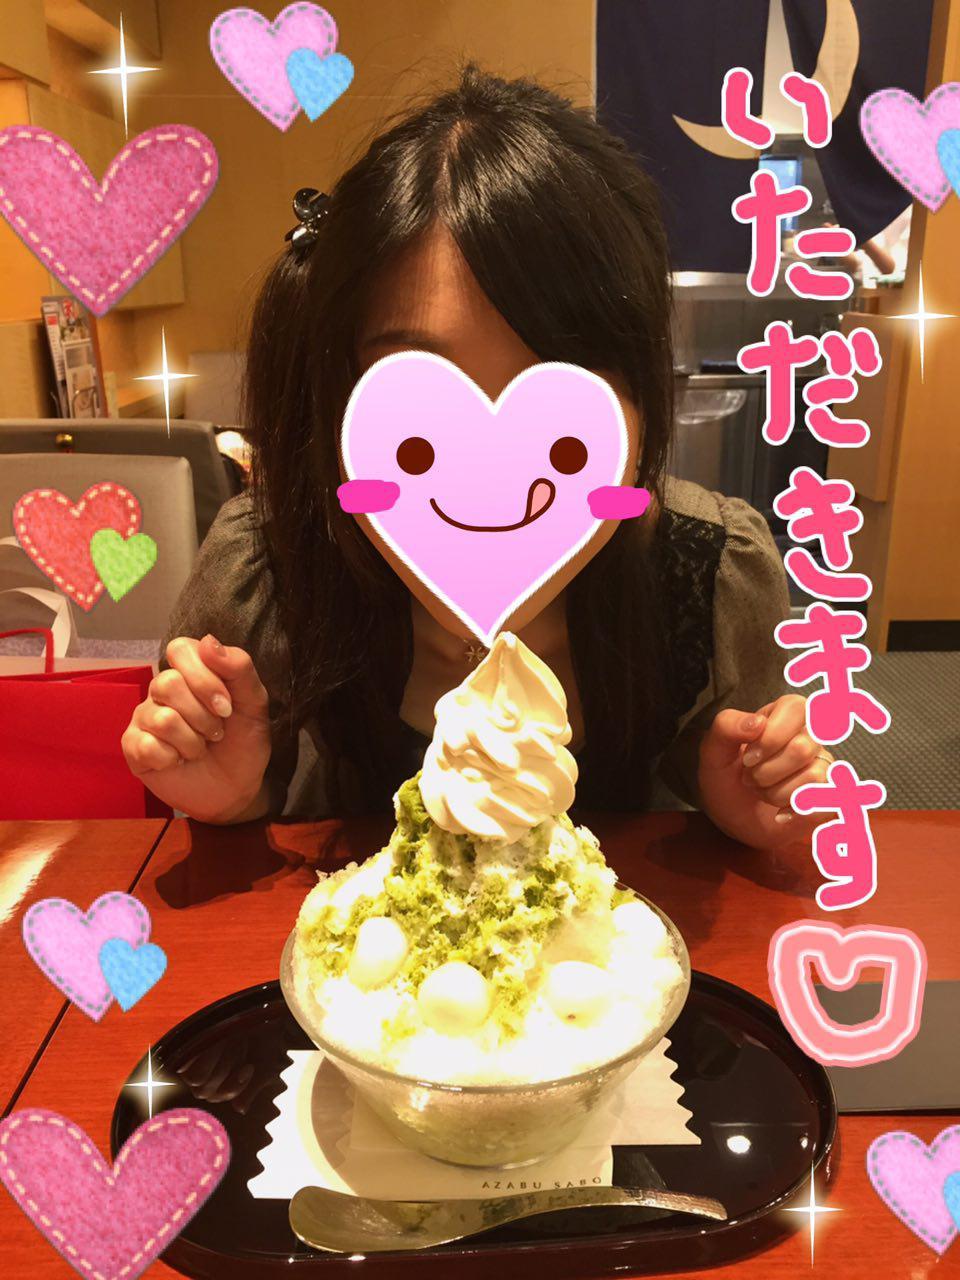 photo_2017-05-06_21-46-31.jpg